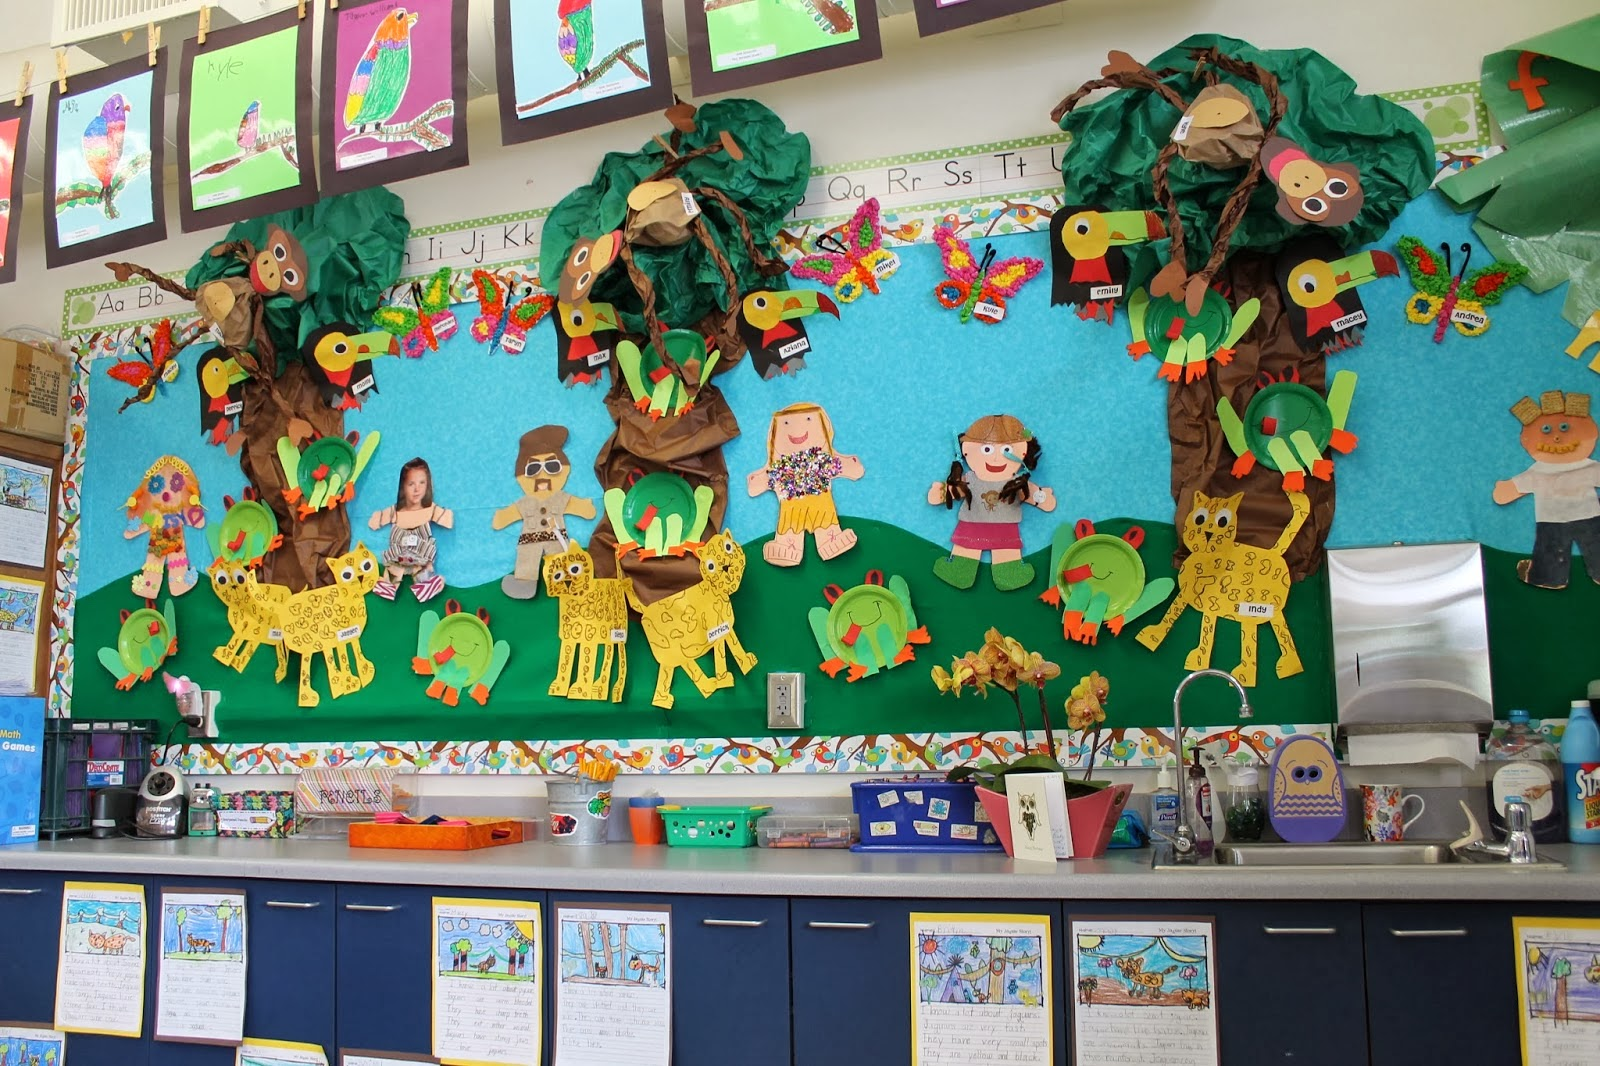 Jungle Worksheet For Preschoolers